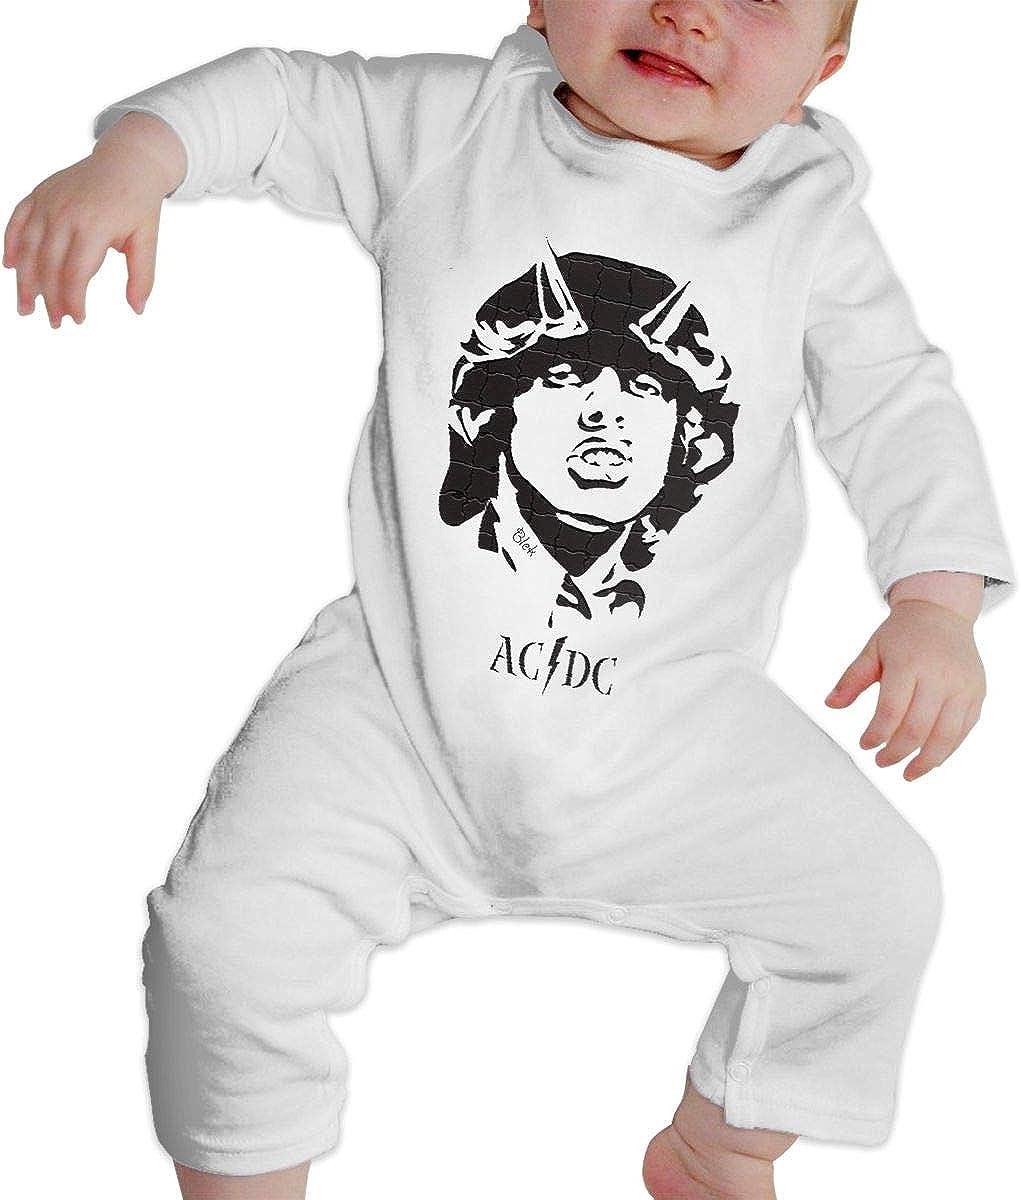 Qq1-asd-store ACDC Boys//Girls Baby Cotton Long Sleeve Romper Warm Bodysuit